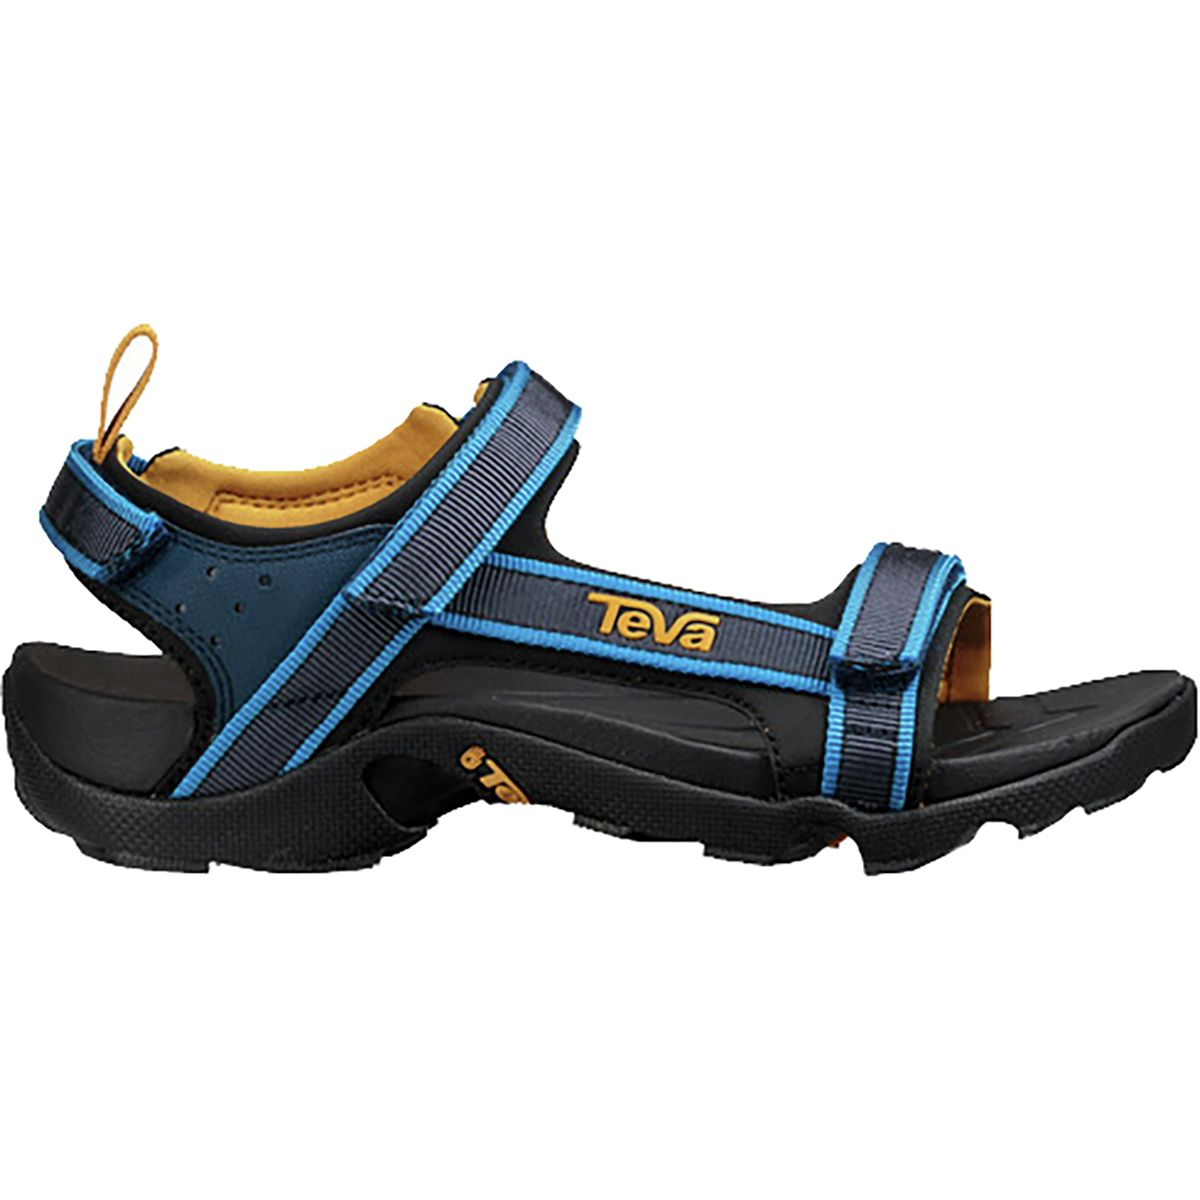 Teva Kids Tanza Sandal